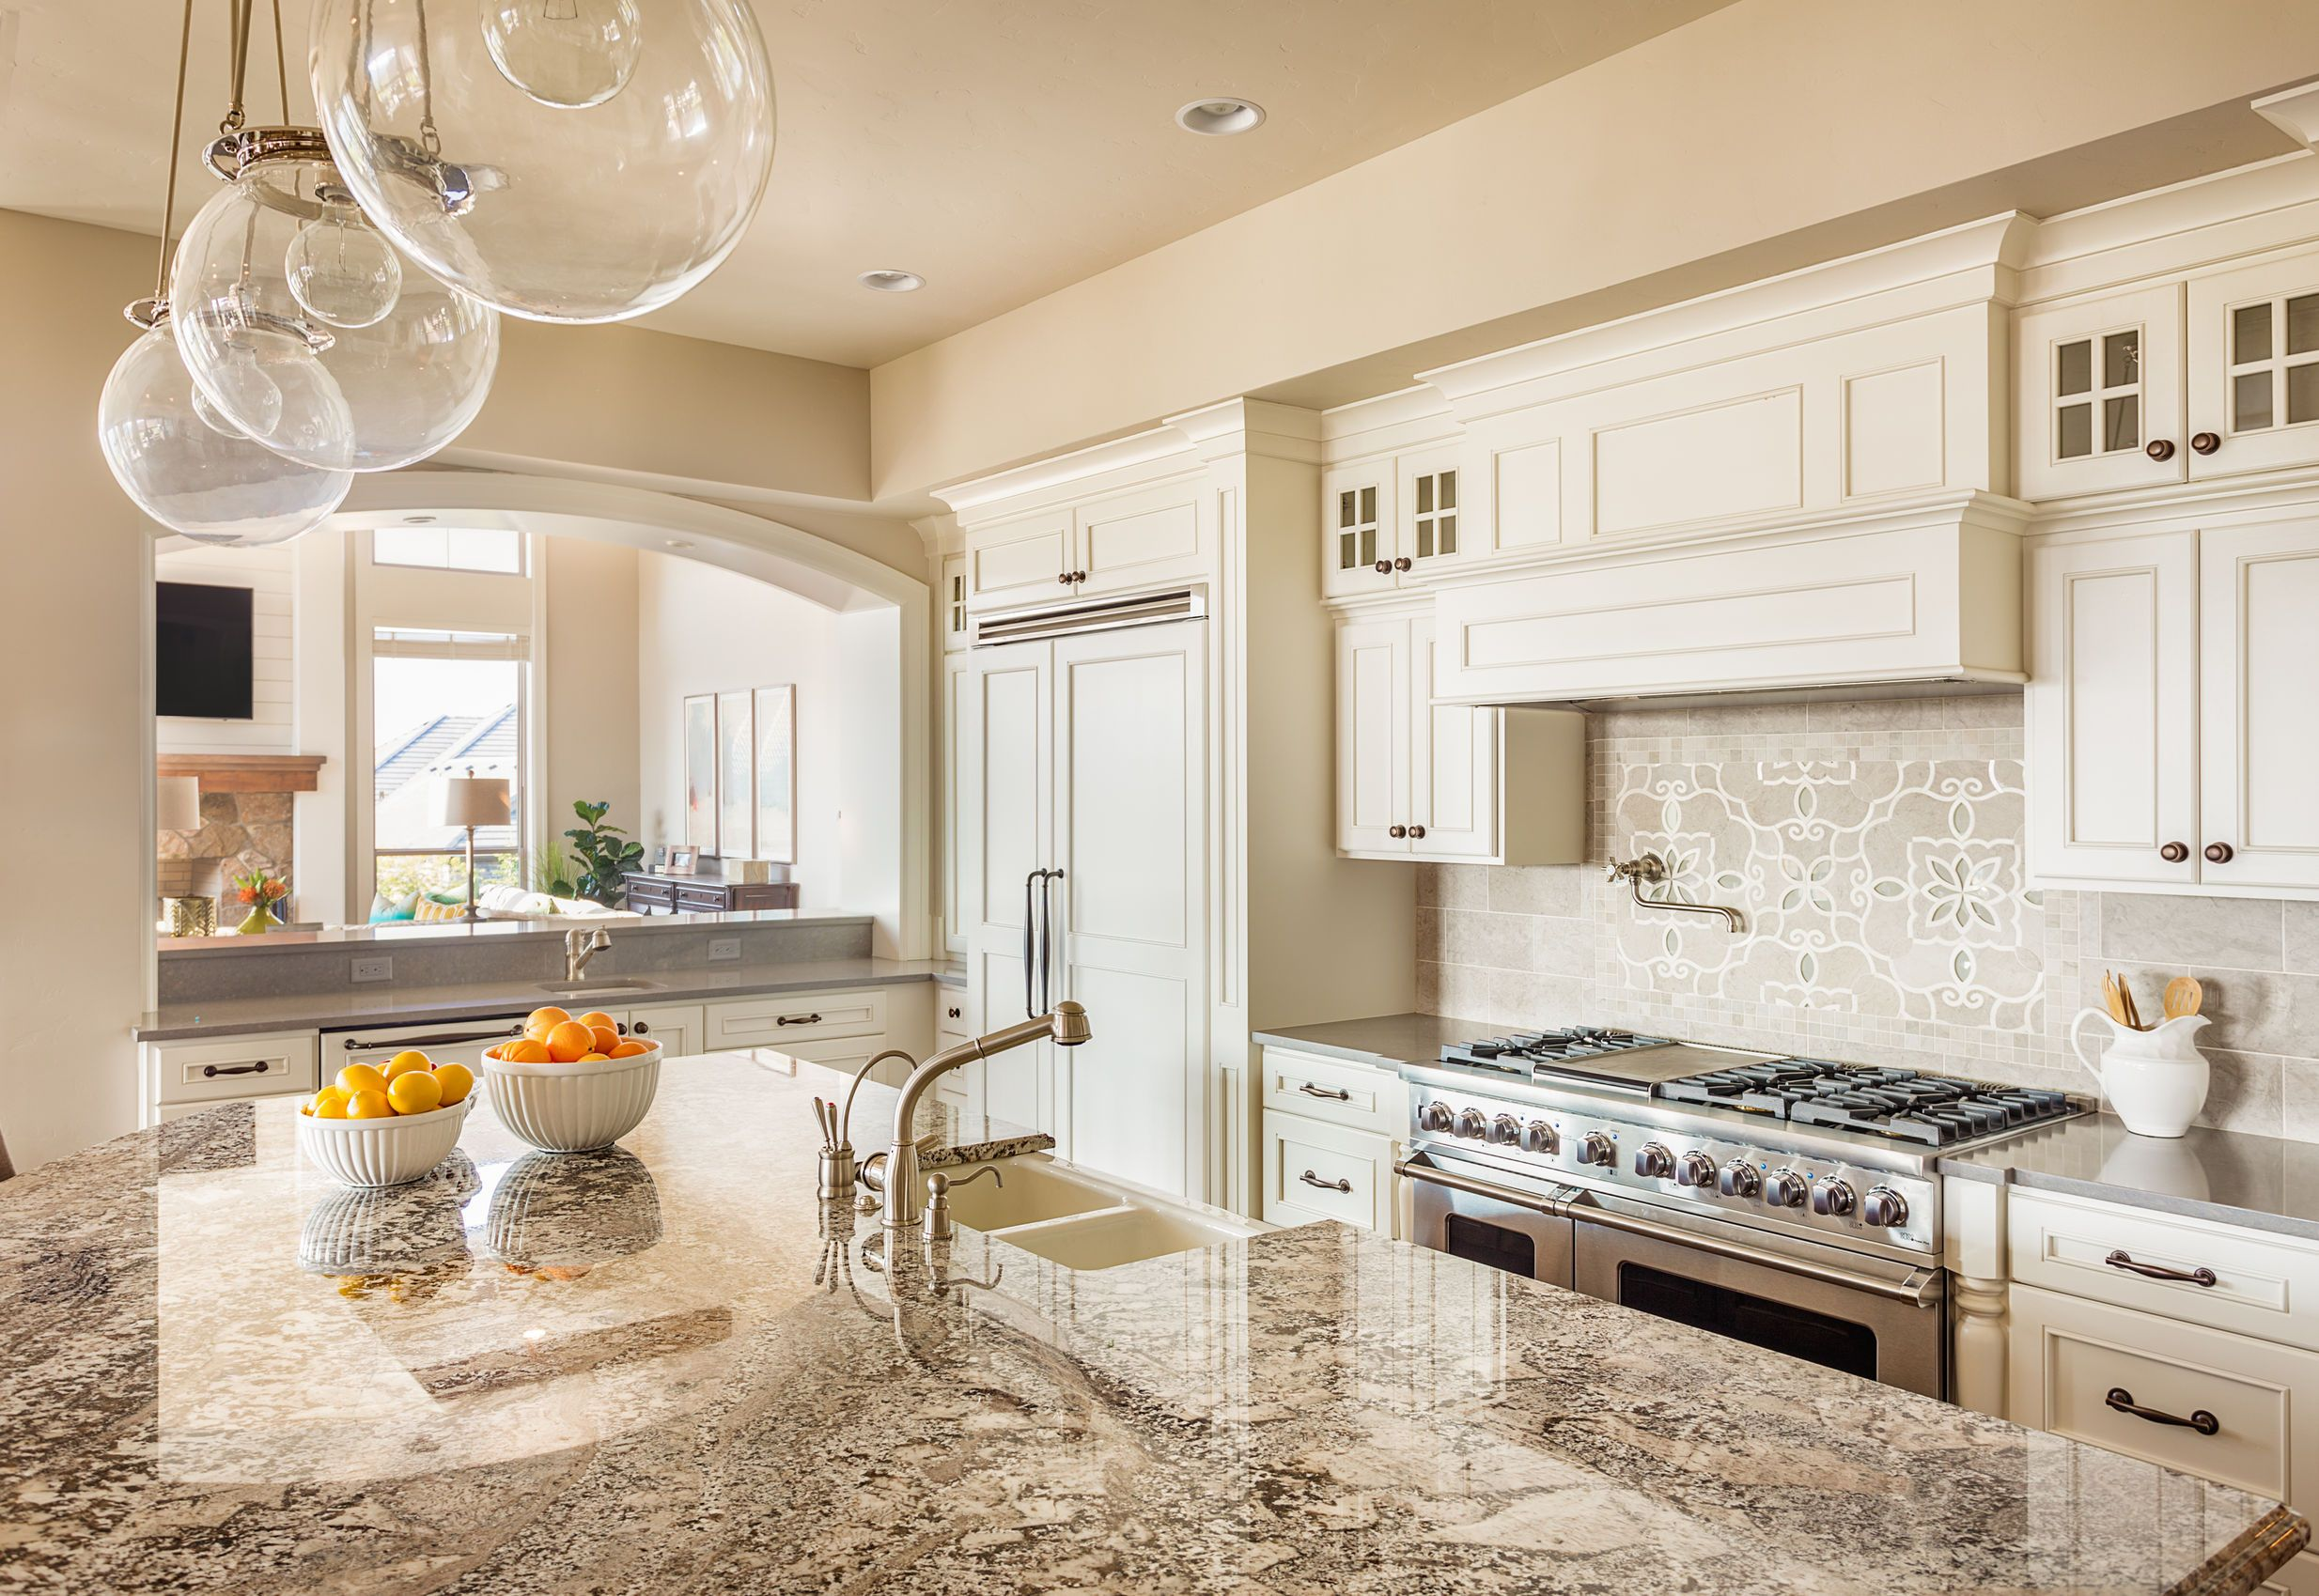 Pin By Designer Kitchens More On Interior Design Services Kitchen Remodel Small Kitchen Remodel Kitchen Design